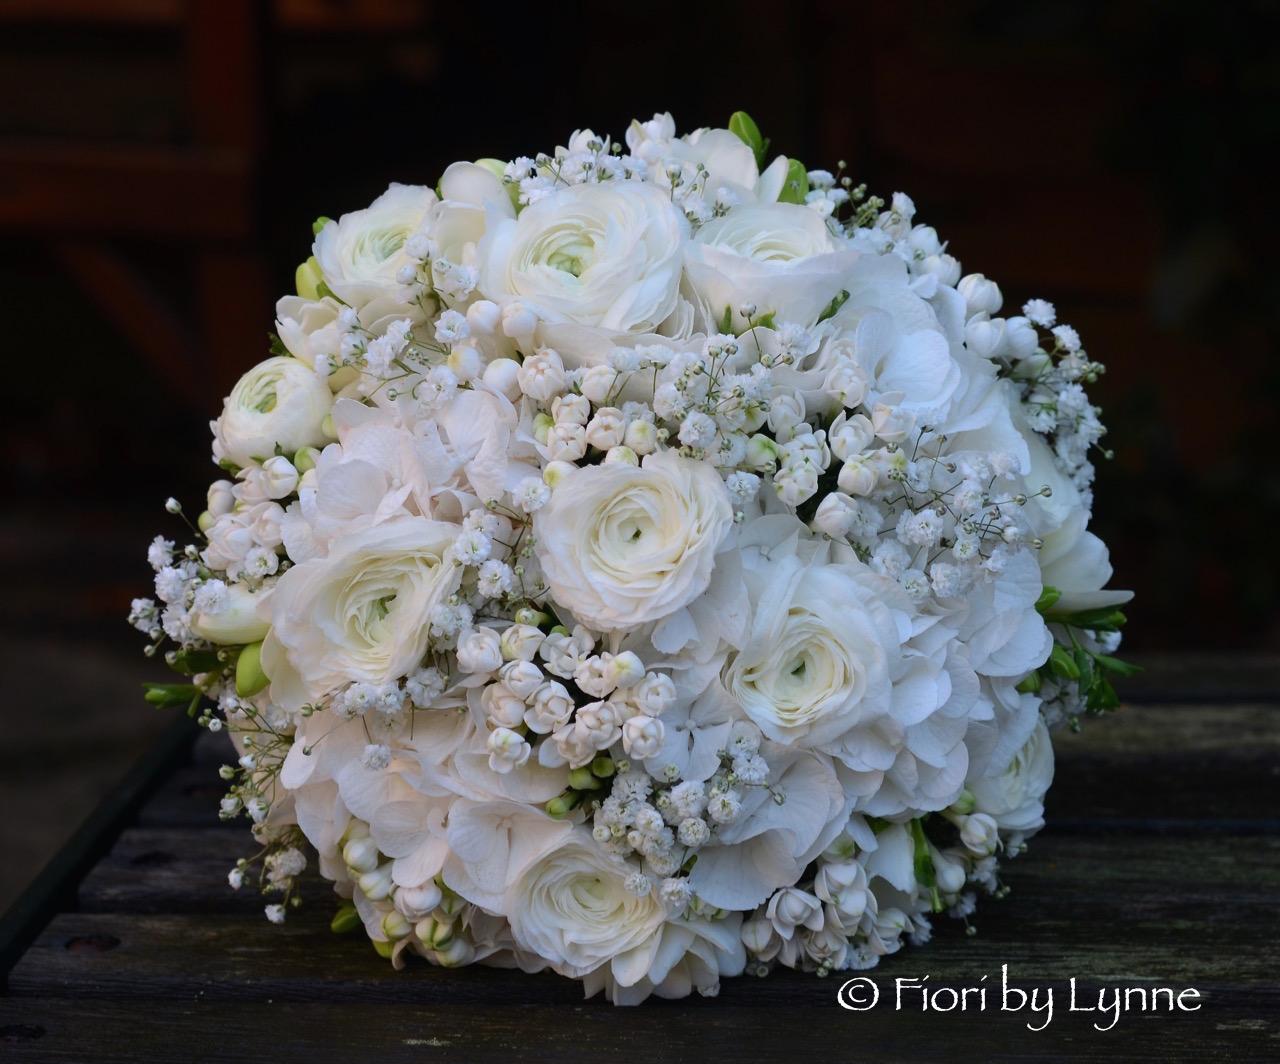 Wedding flowers blog naomis rustic style white and silver wedding naomis rustic style white and silver wedding flowers fitzleroi barm west sussex mightylinksfo